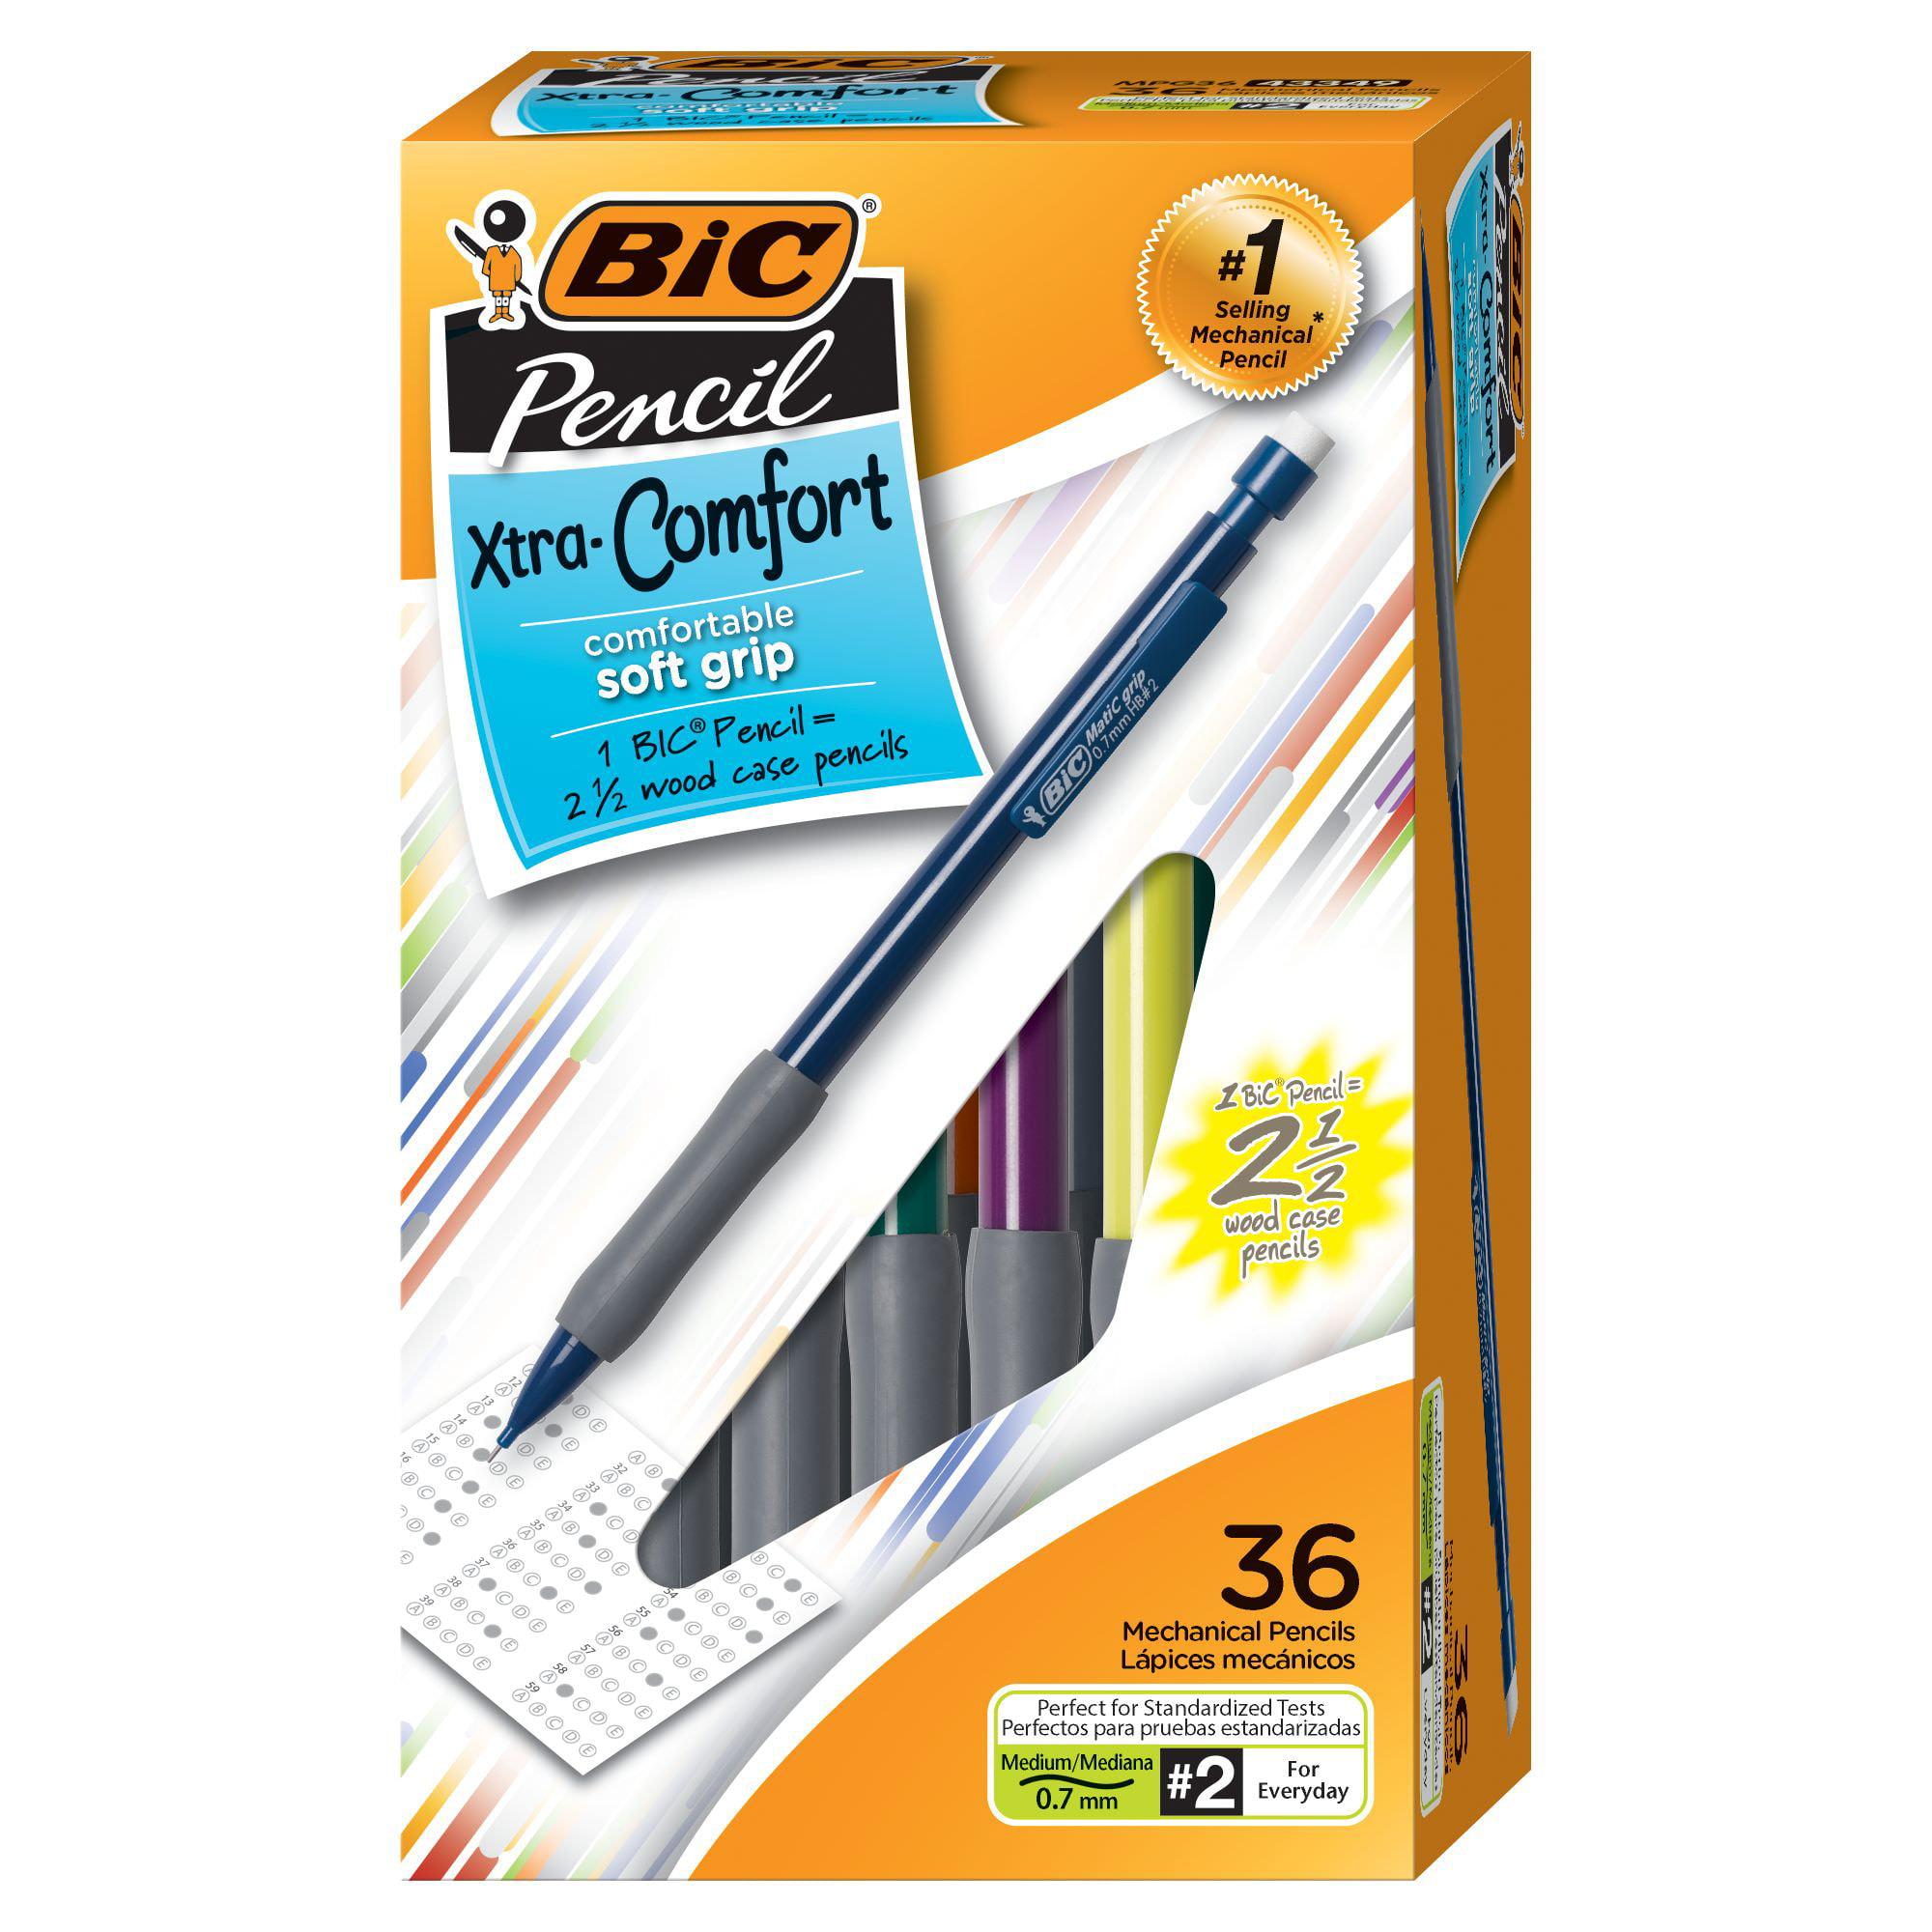 BIC Xtra Comfort Mechanical Pencil, Medium Point (0.7mm), 36 Count